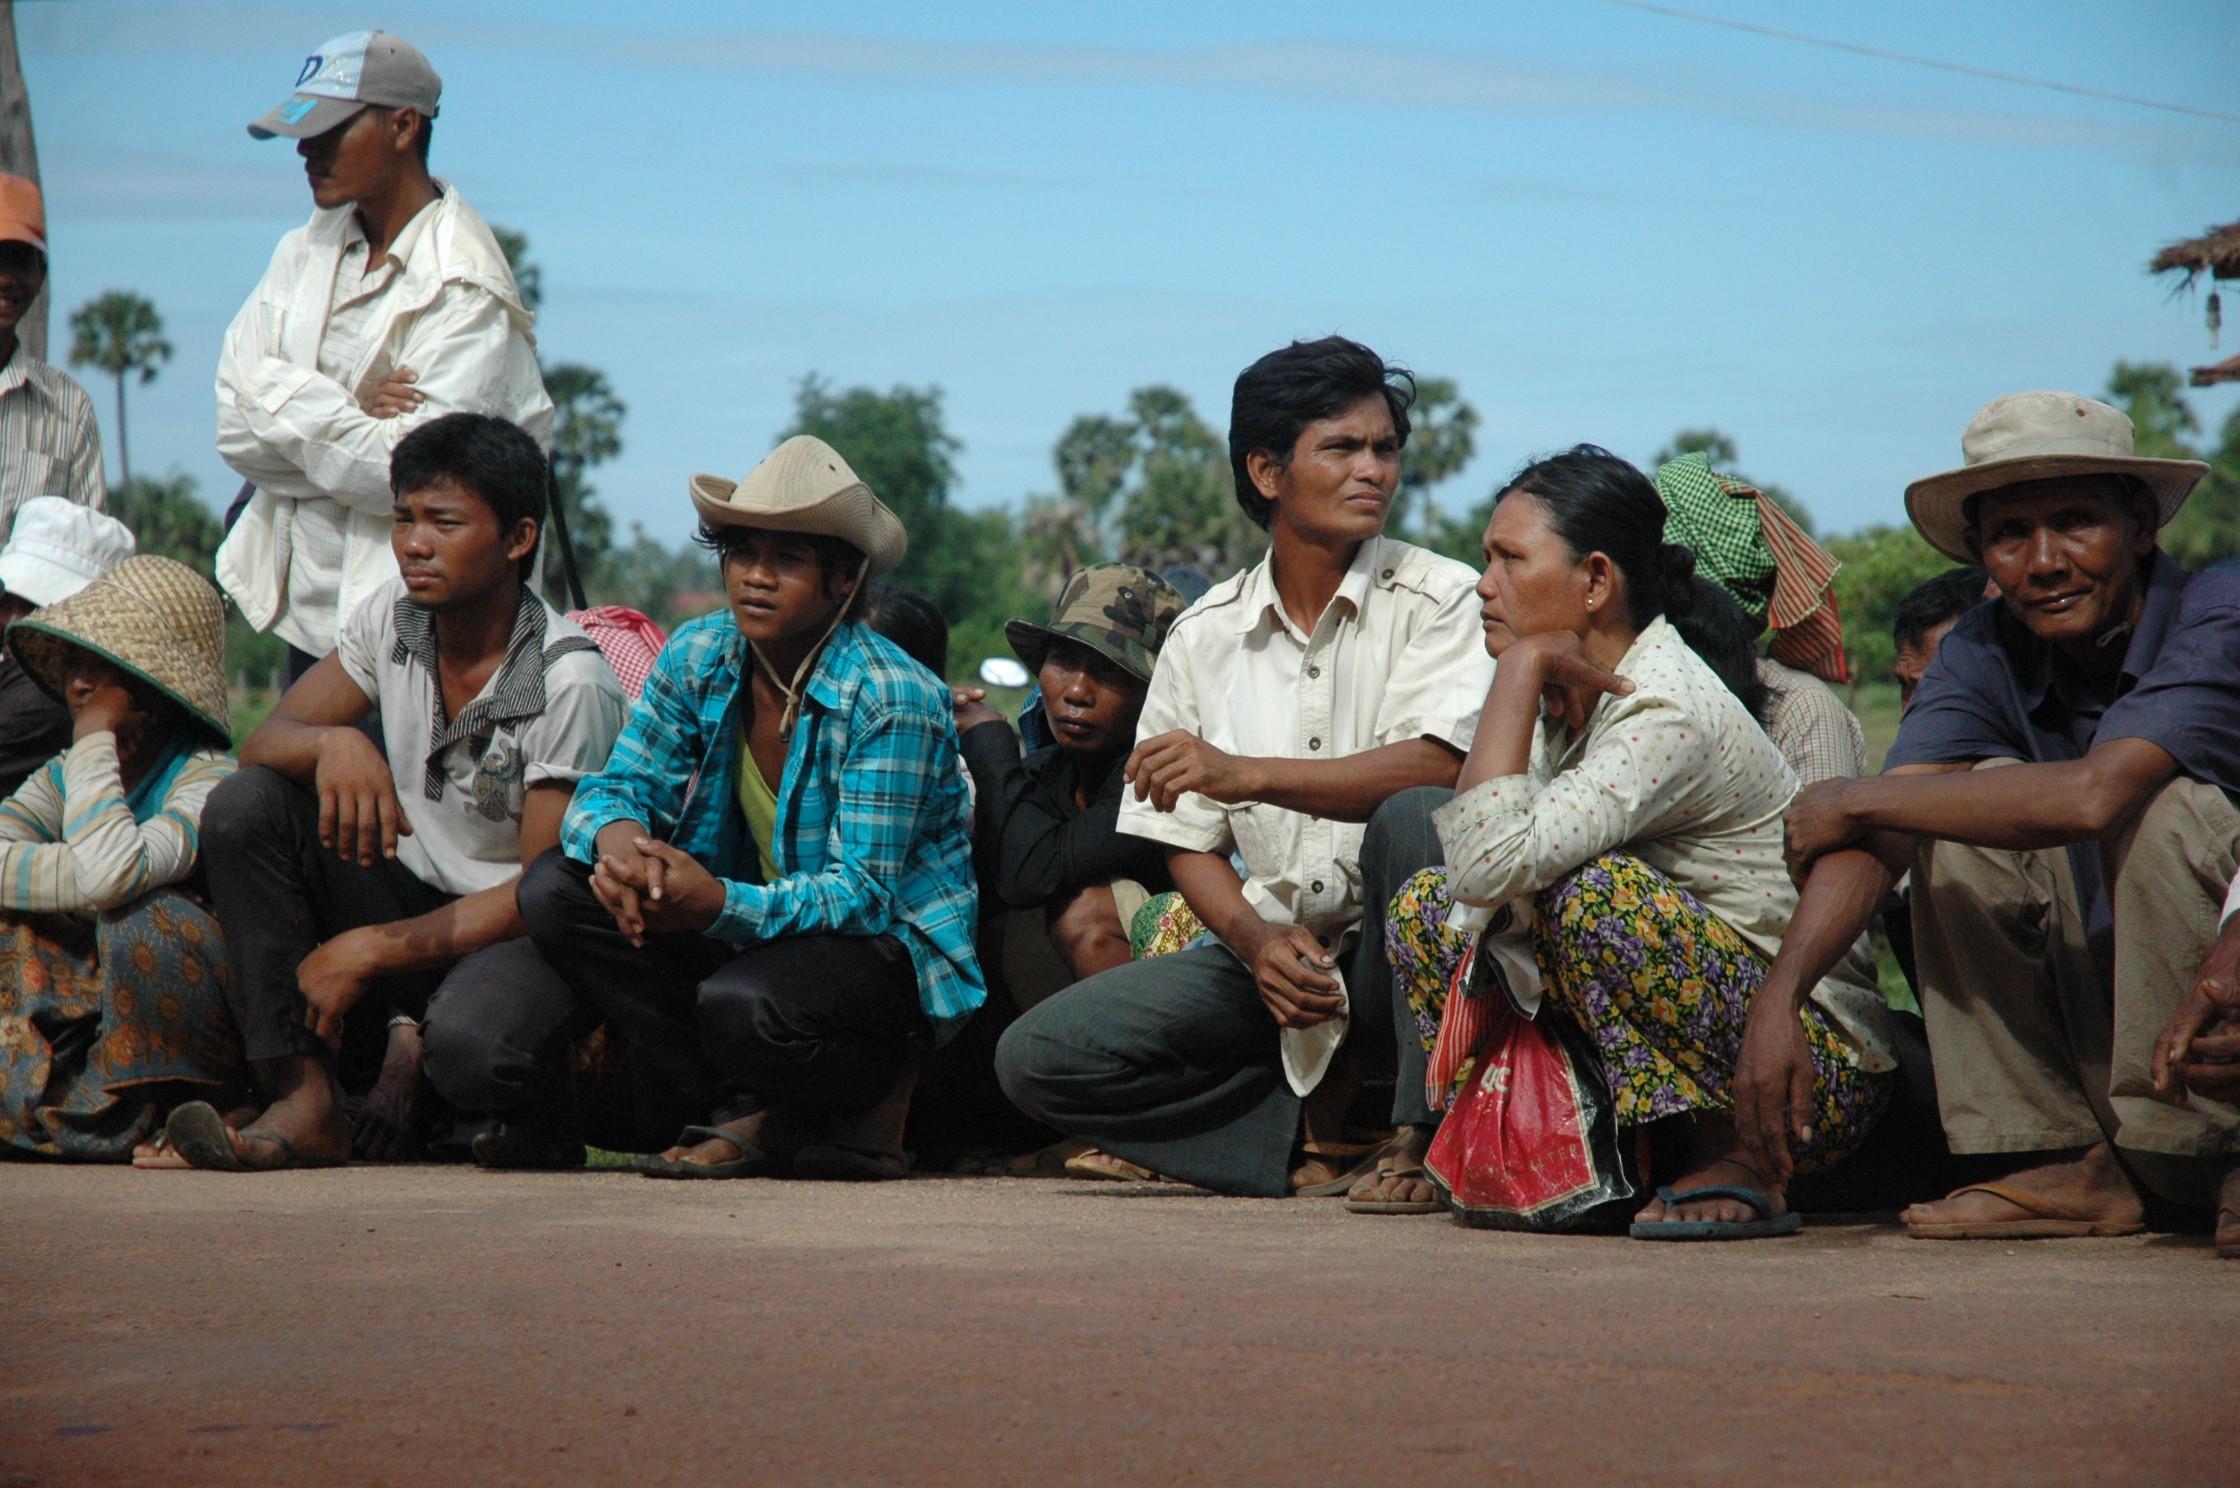 Cambodia land rights activists flickr